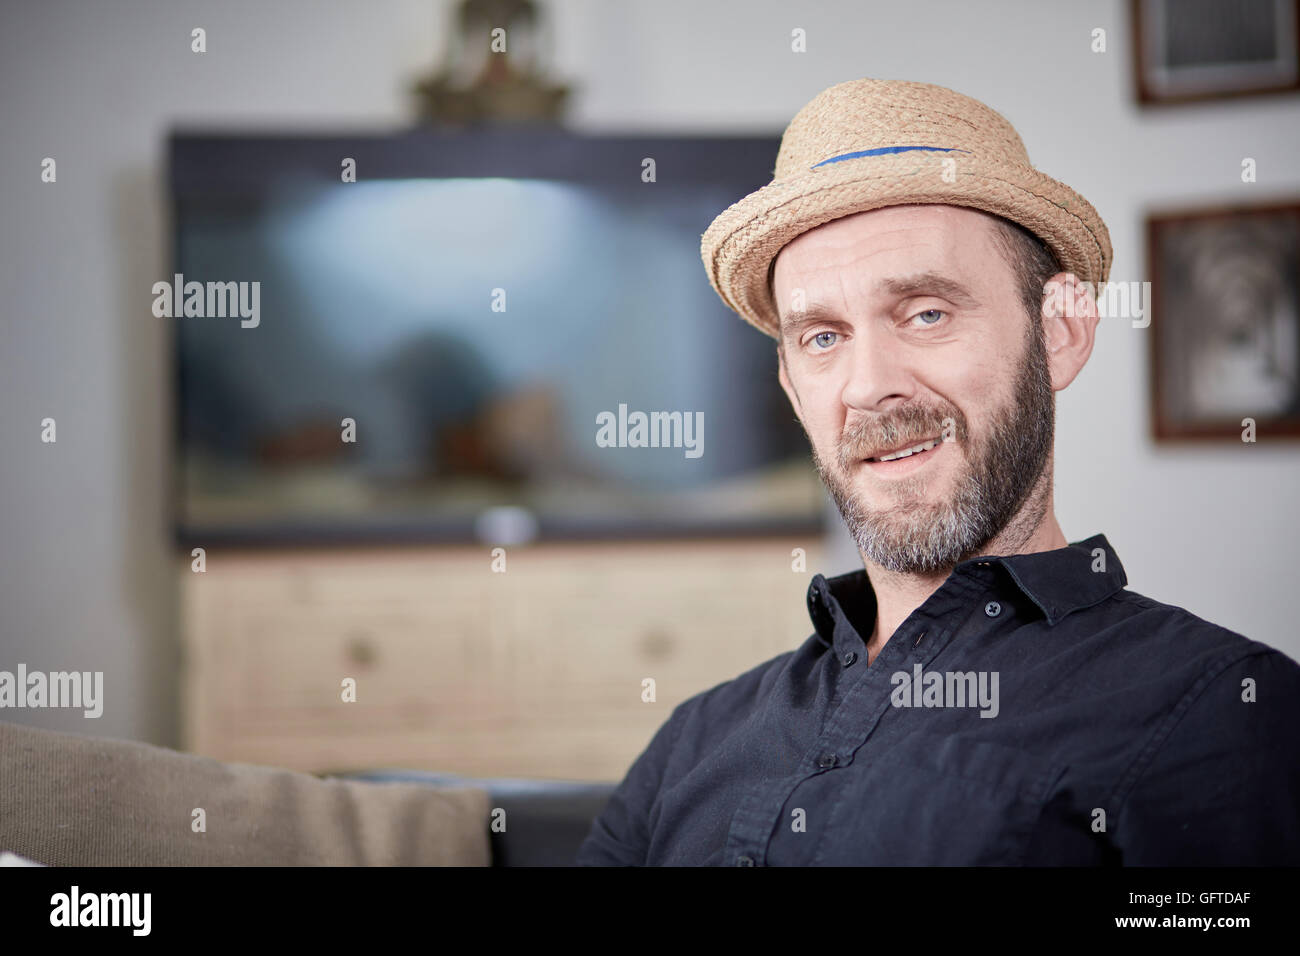 Happy man portrait sitting at home in front of aquarium - Stock Image